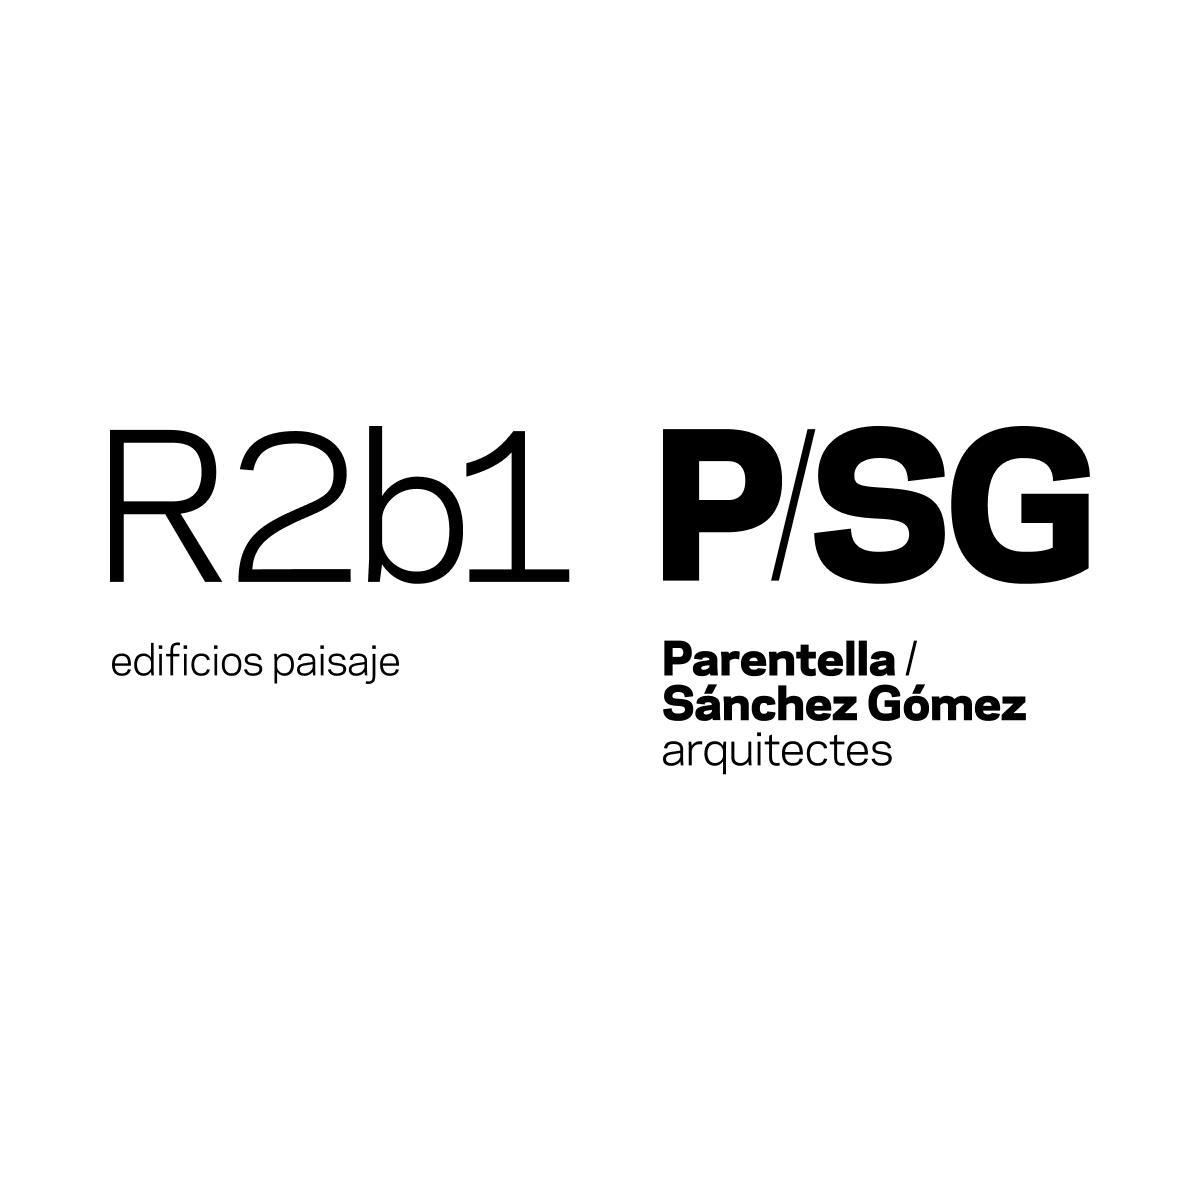 psgr2b1_post_blanco